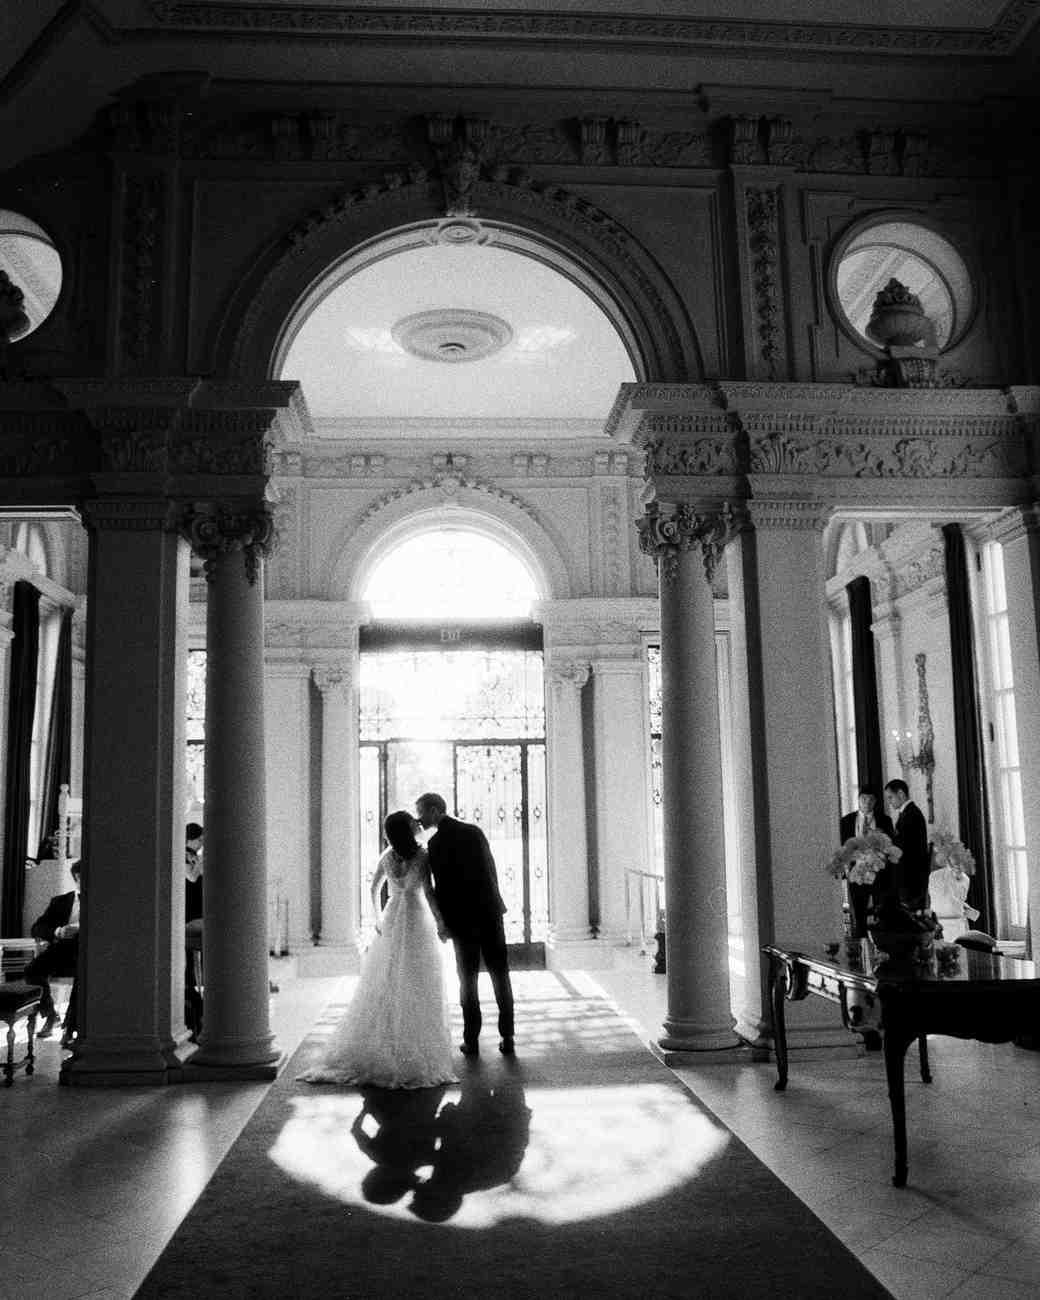 lissy-steven-wedding-newport-kiss-86-elizabethmessina-s112907-0516.jpg